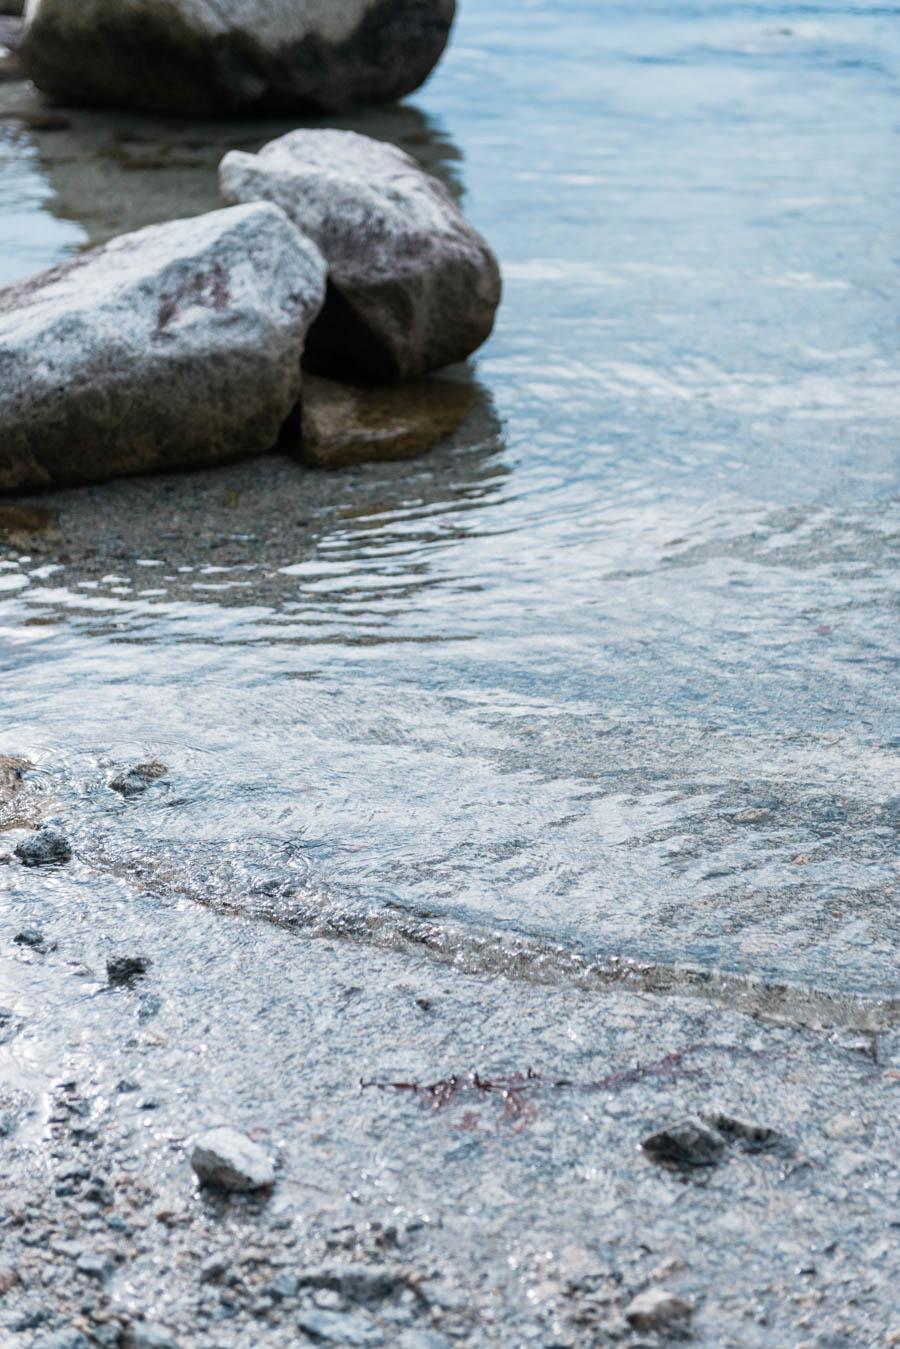 Stones and flowing water in a fjord in Eidfjord in Hardanger in Norway